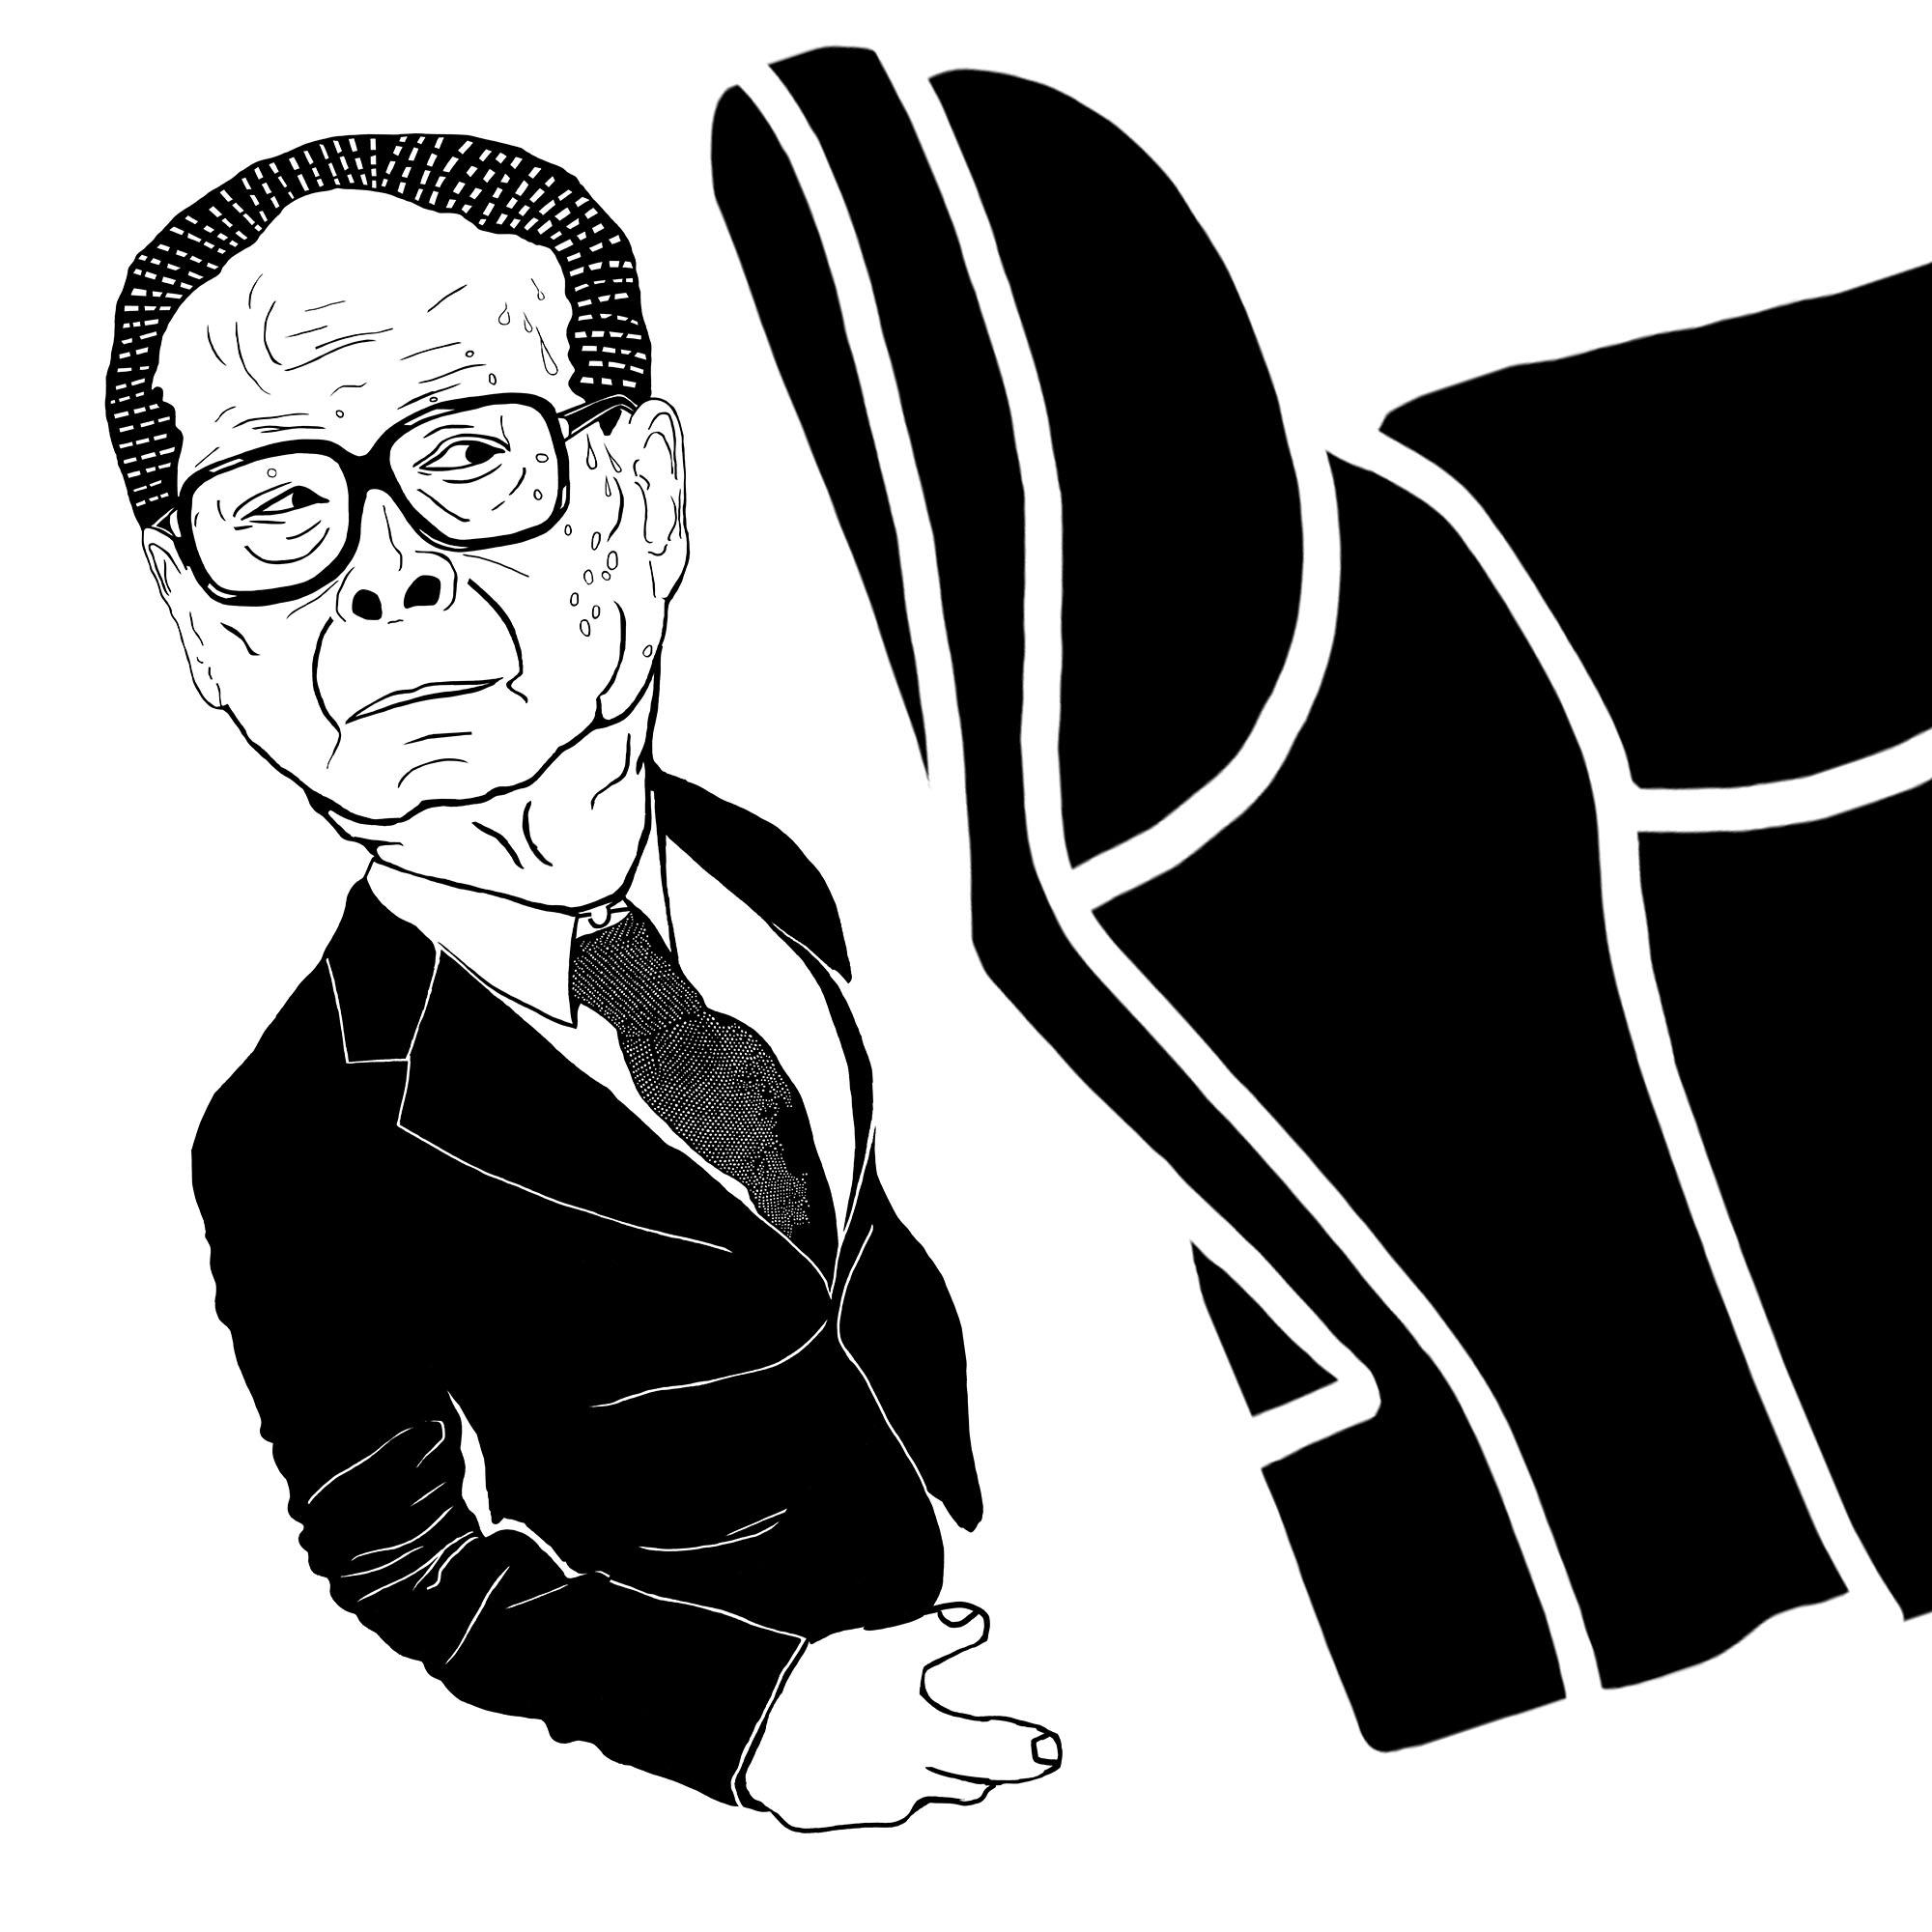 Looks like Xi Jinping regime is closing in on Jiang Zemin